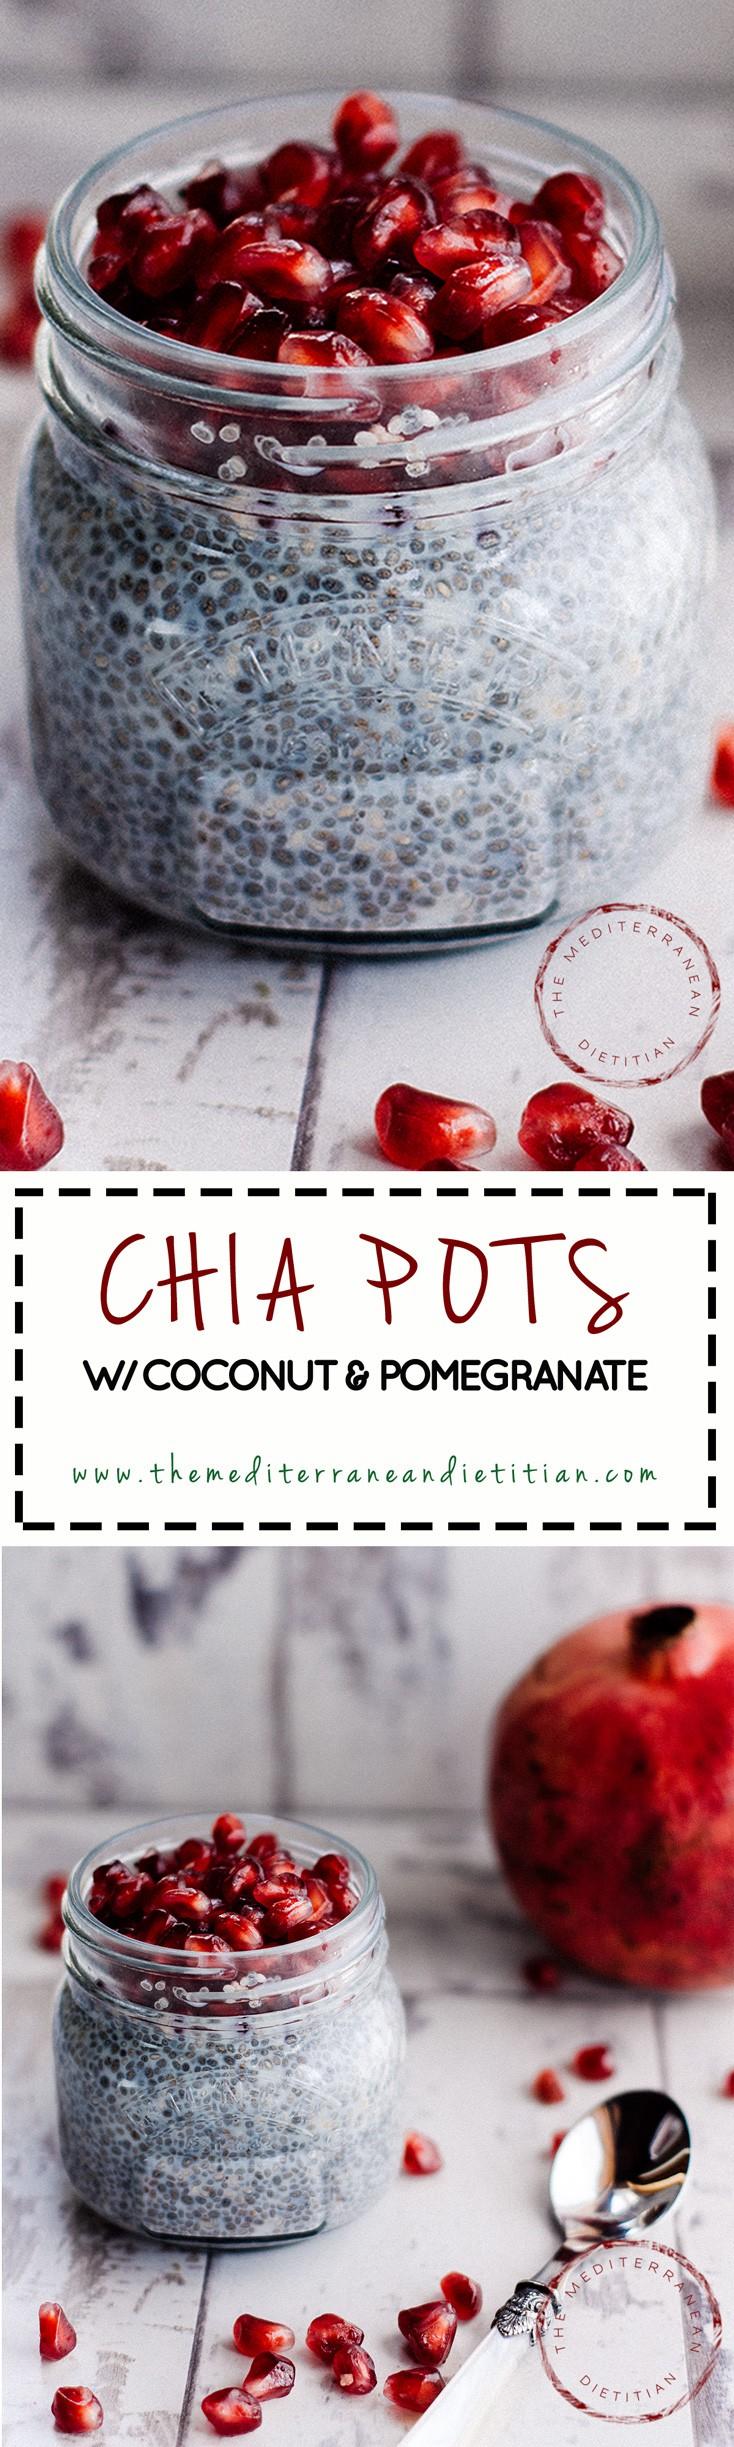 Pomegranate CHIA POTS